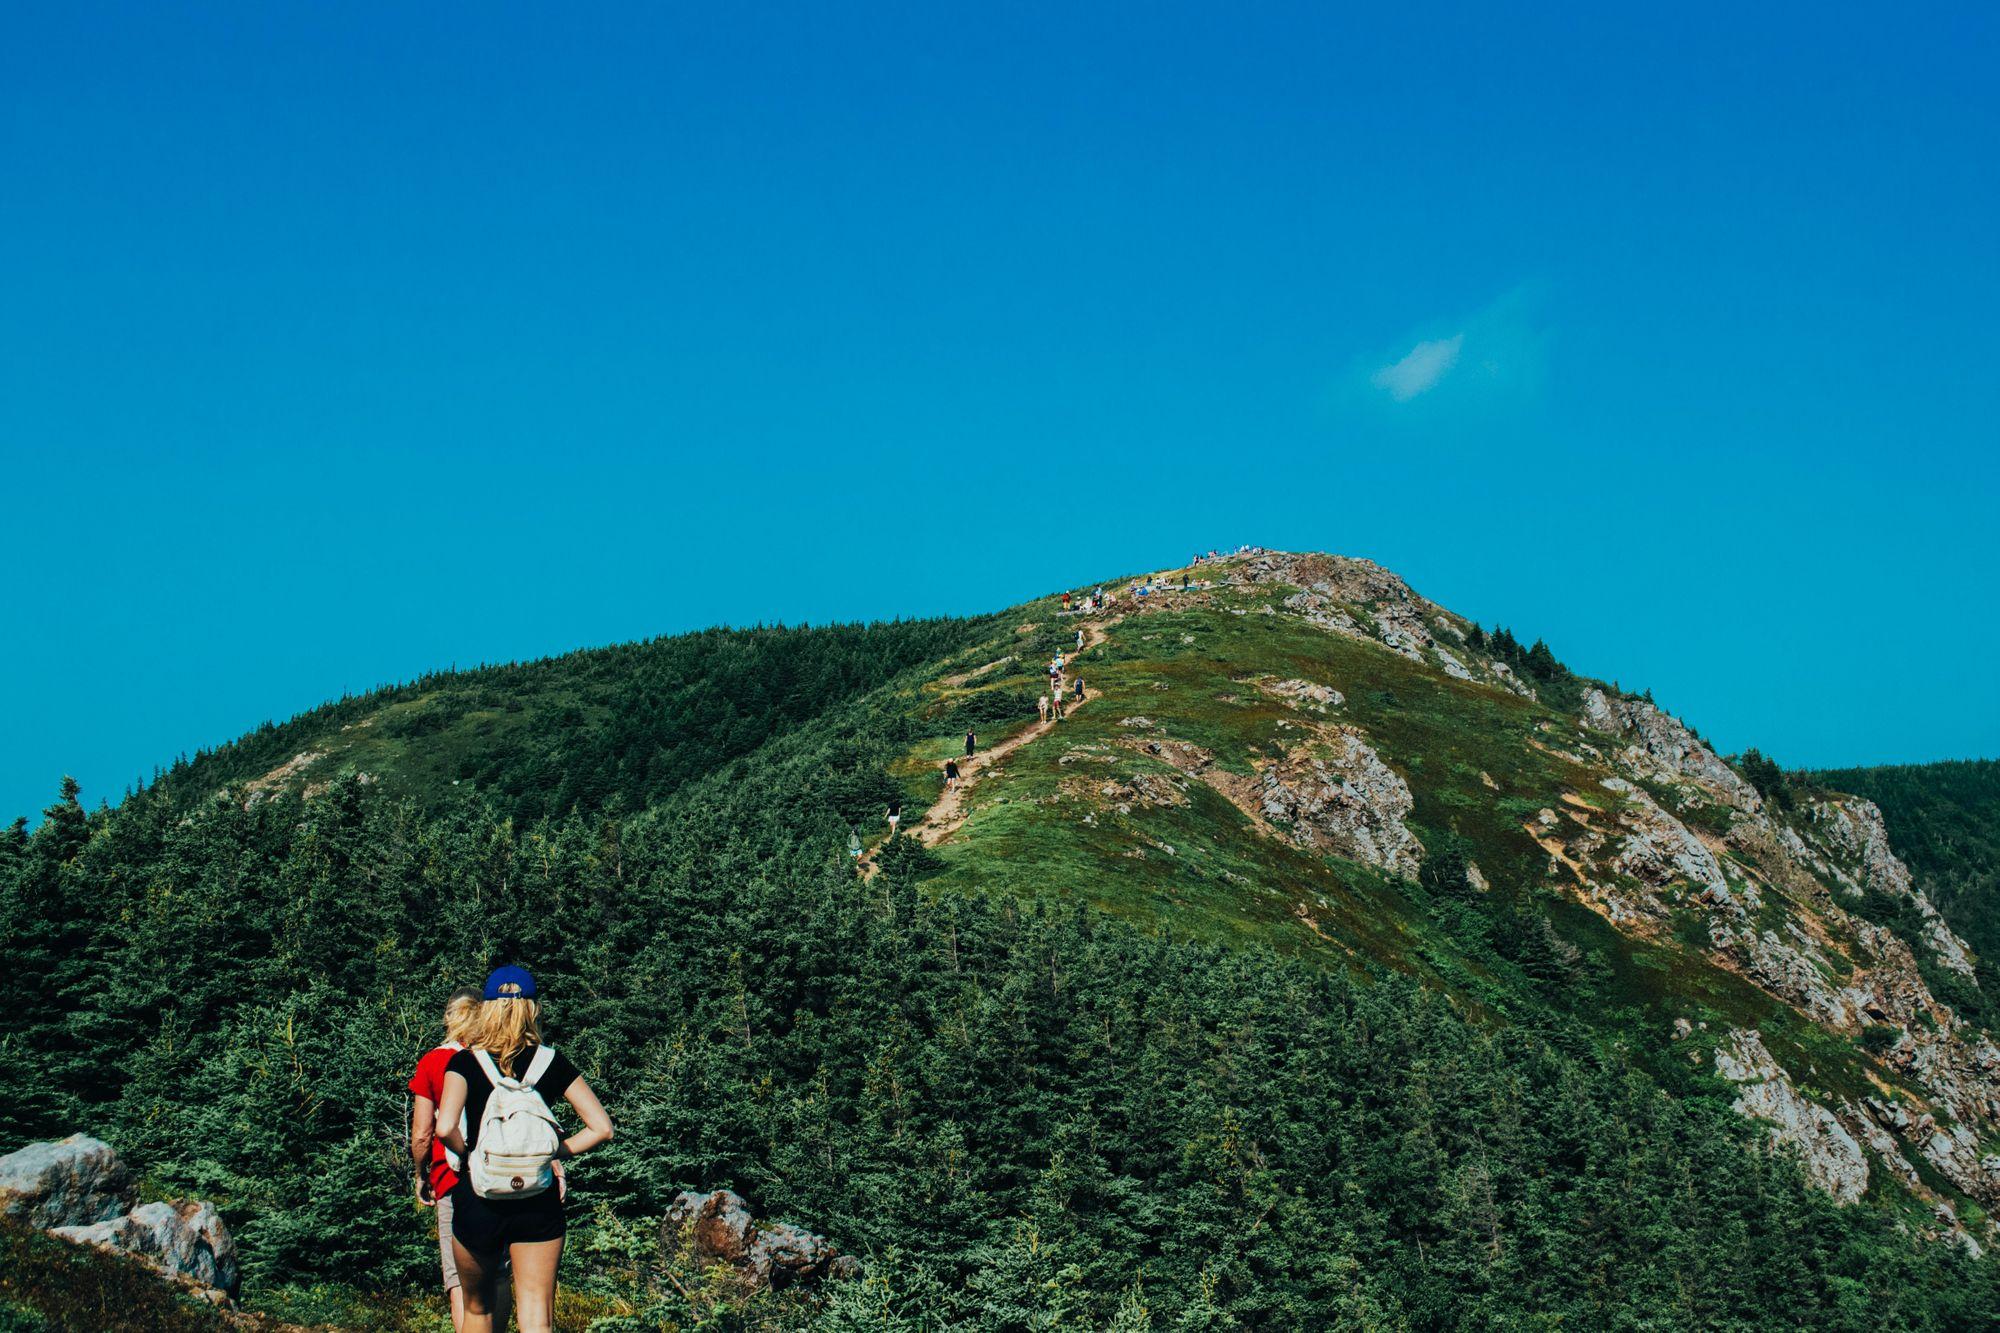 Find home exchanges in Cape Breton Highlands National Park in Nova Scotia